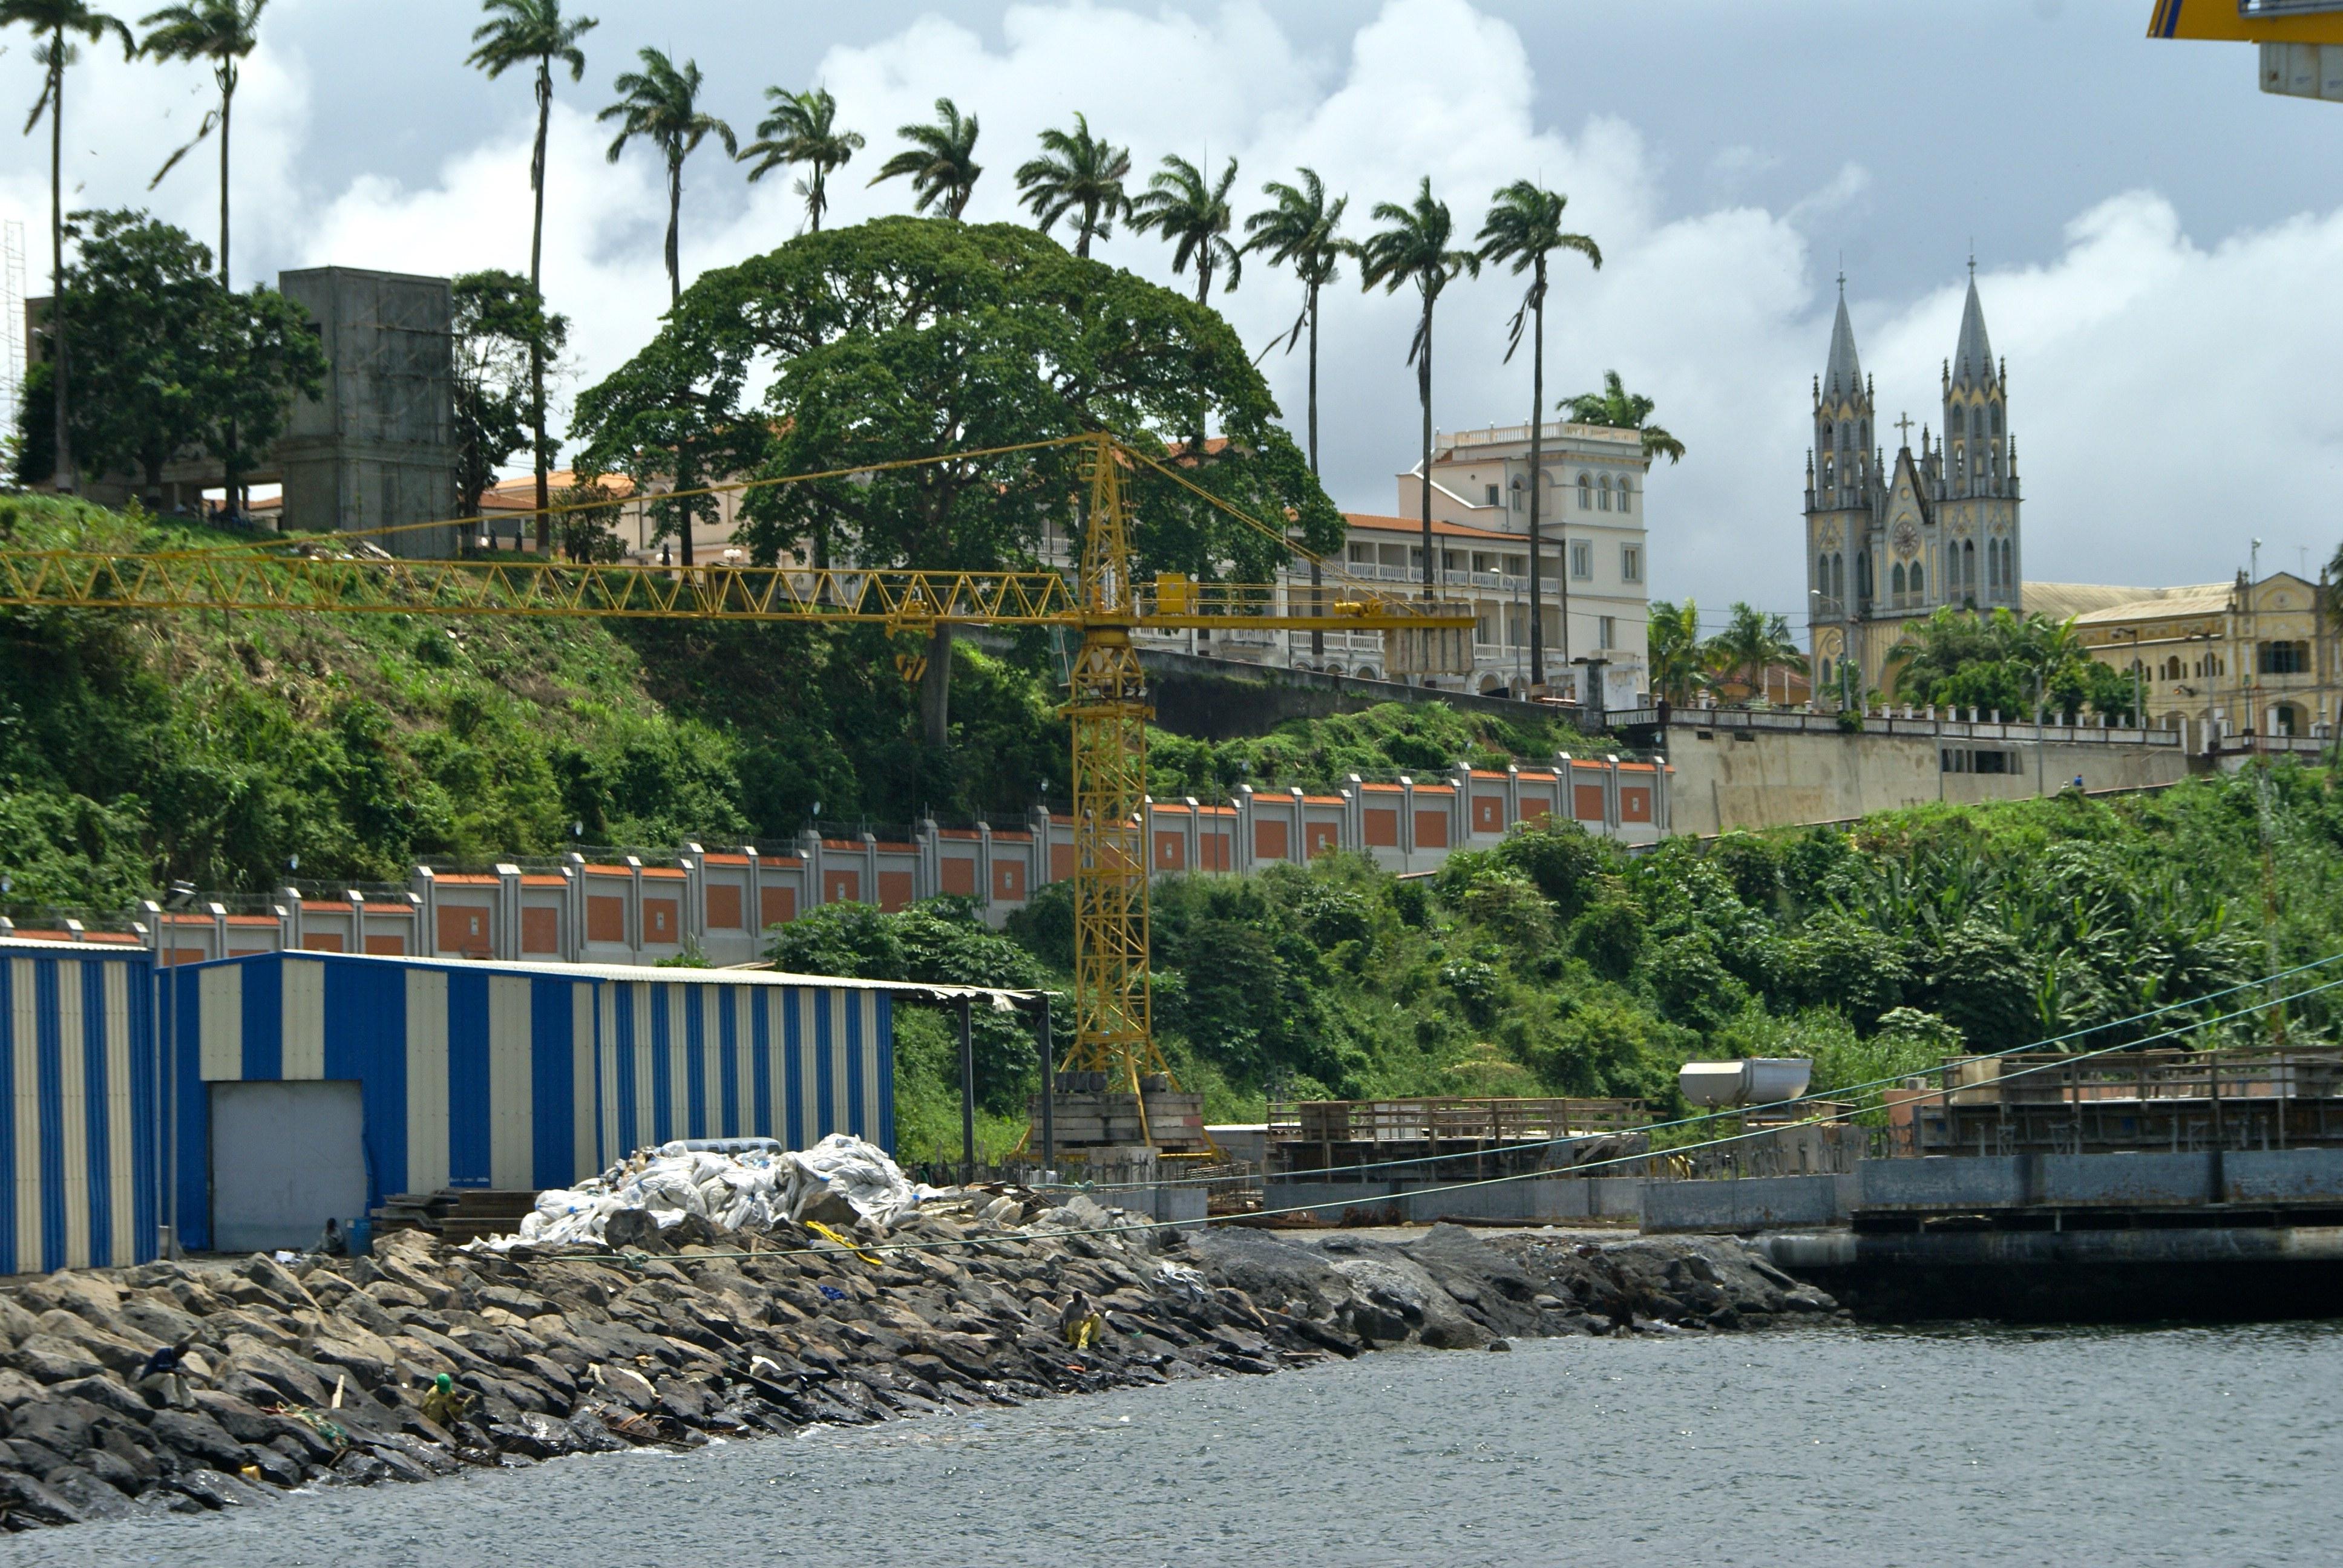 IMF: Delay Vote on Equatorial Guinea Loan